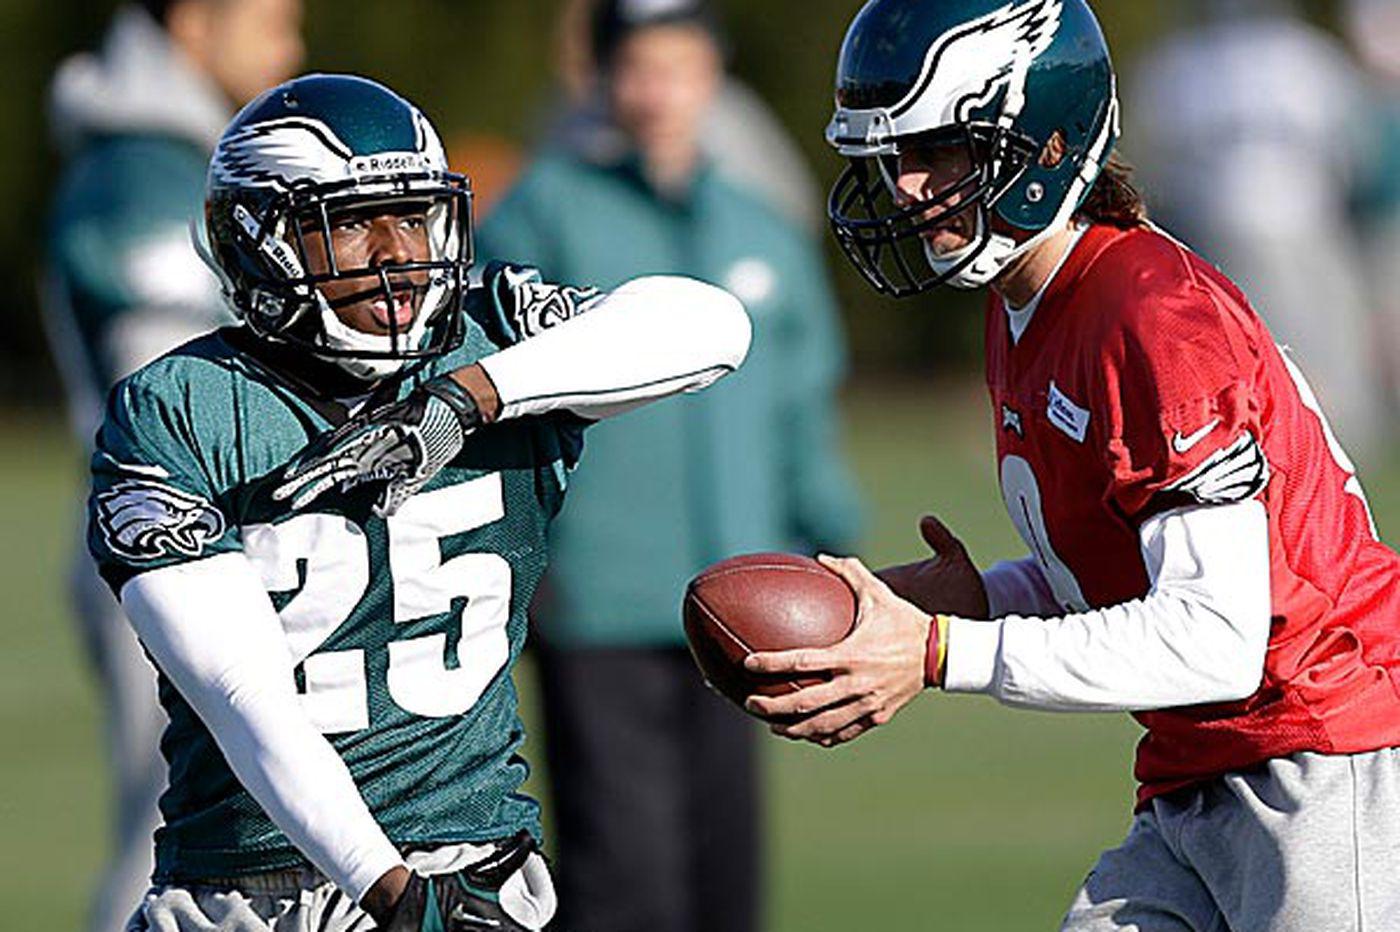 Redskins game not meaningless for Eagles running back LeSean McCoy, who will return